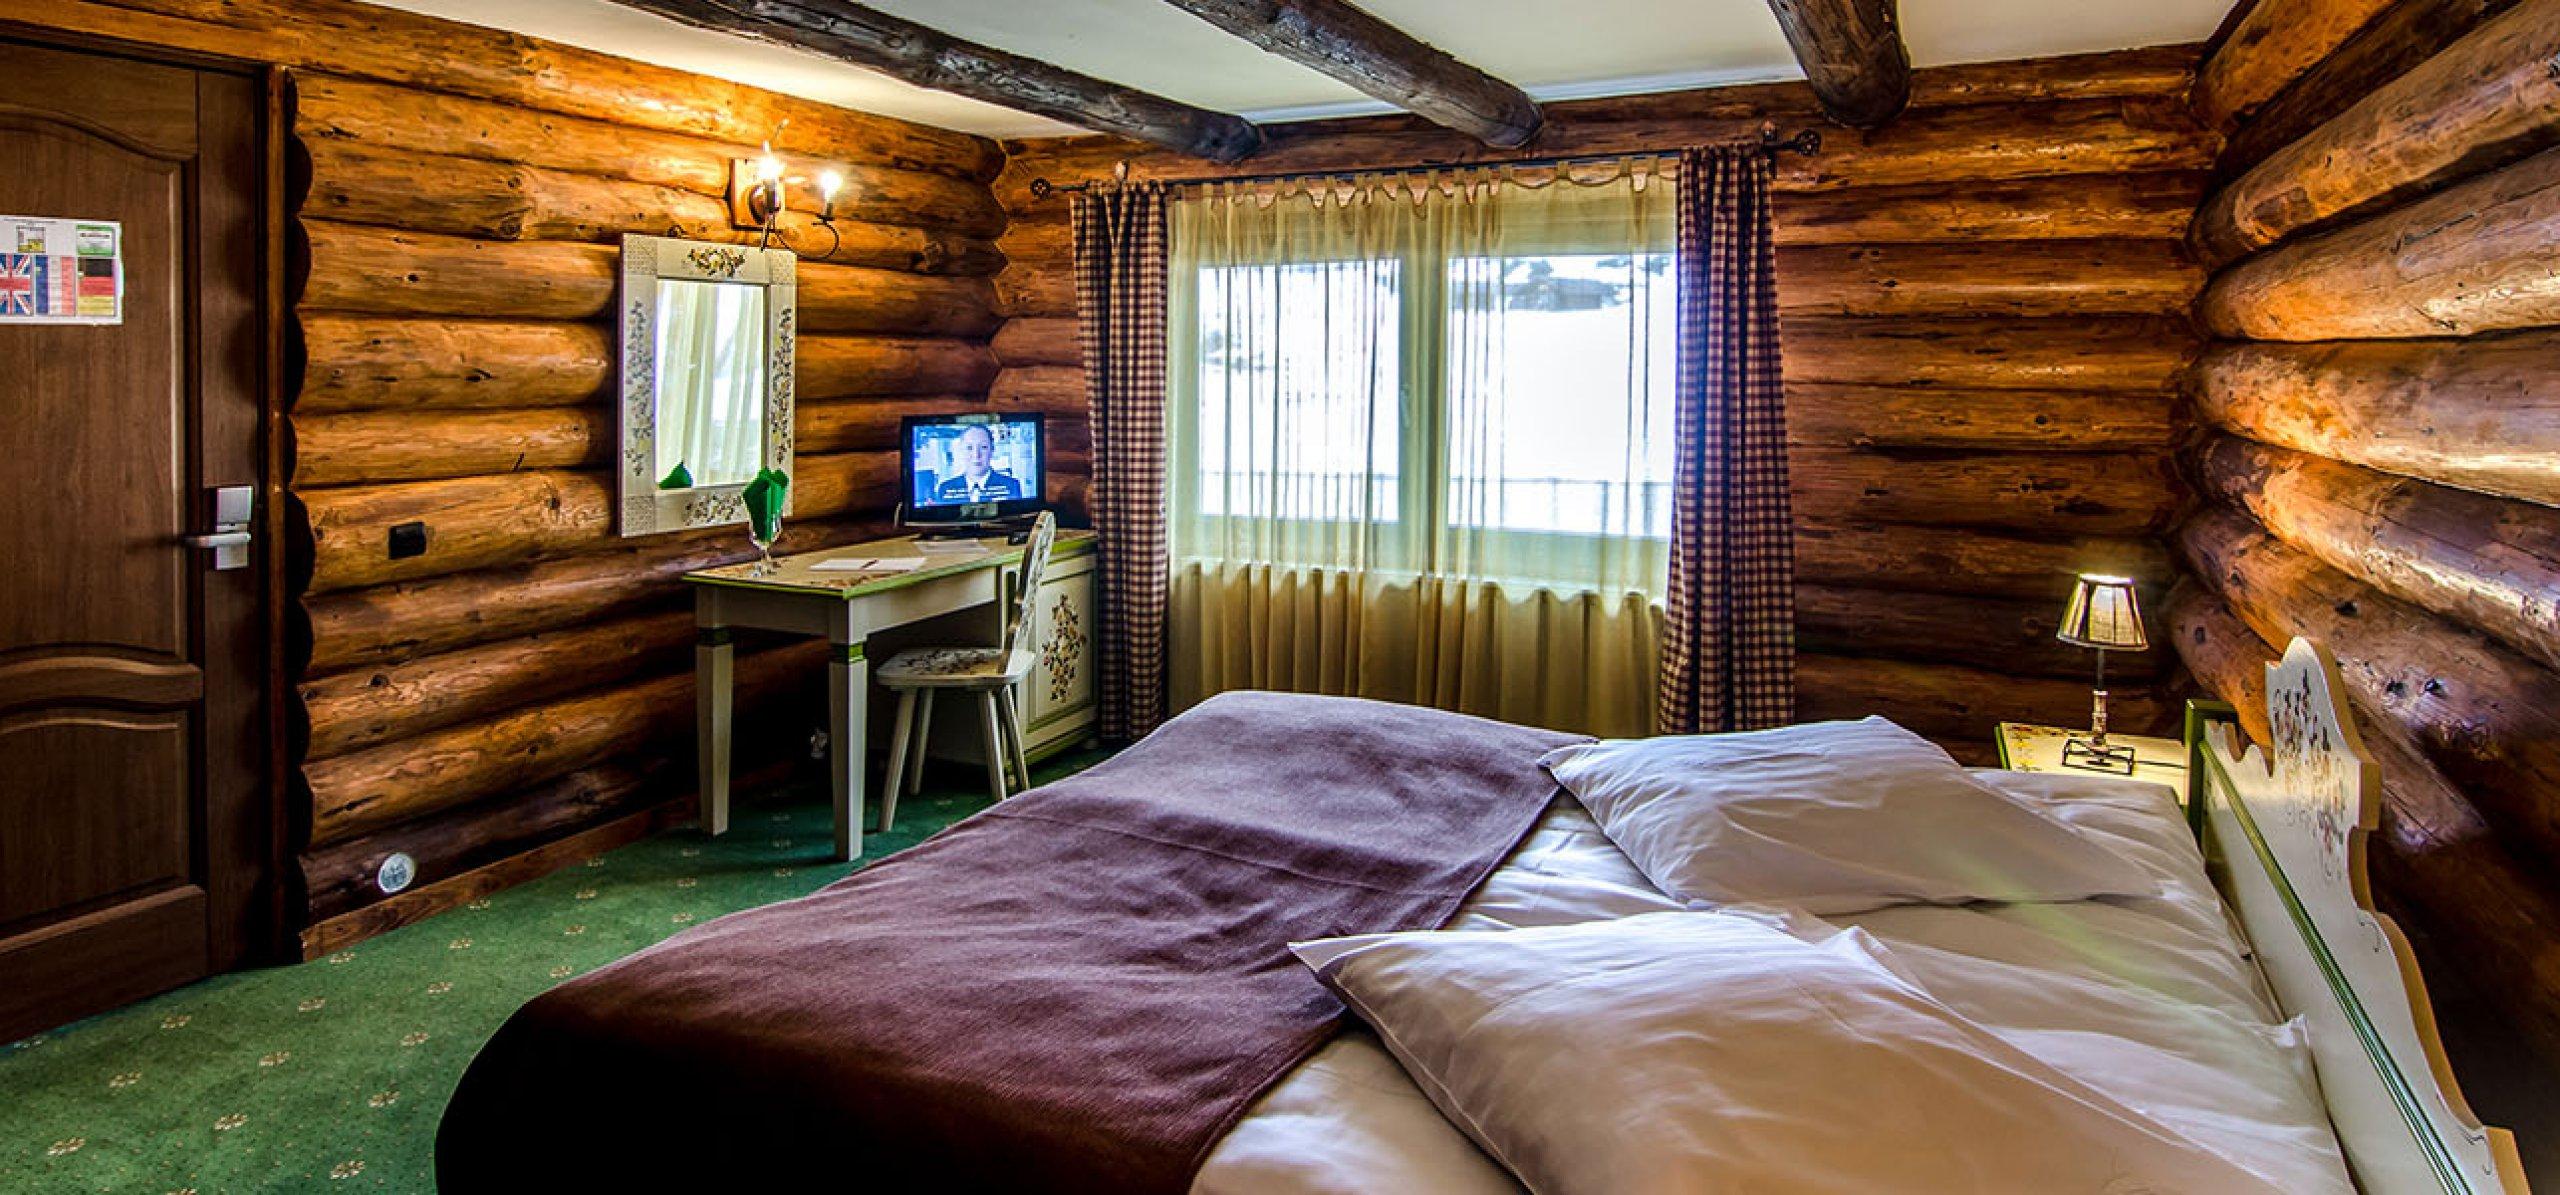 intim-camera-dubla-matrimoniala-vila-carpenul-cheile-gradistei-fundata